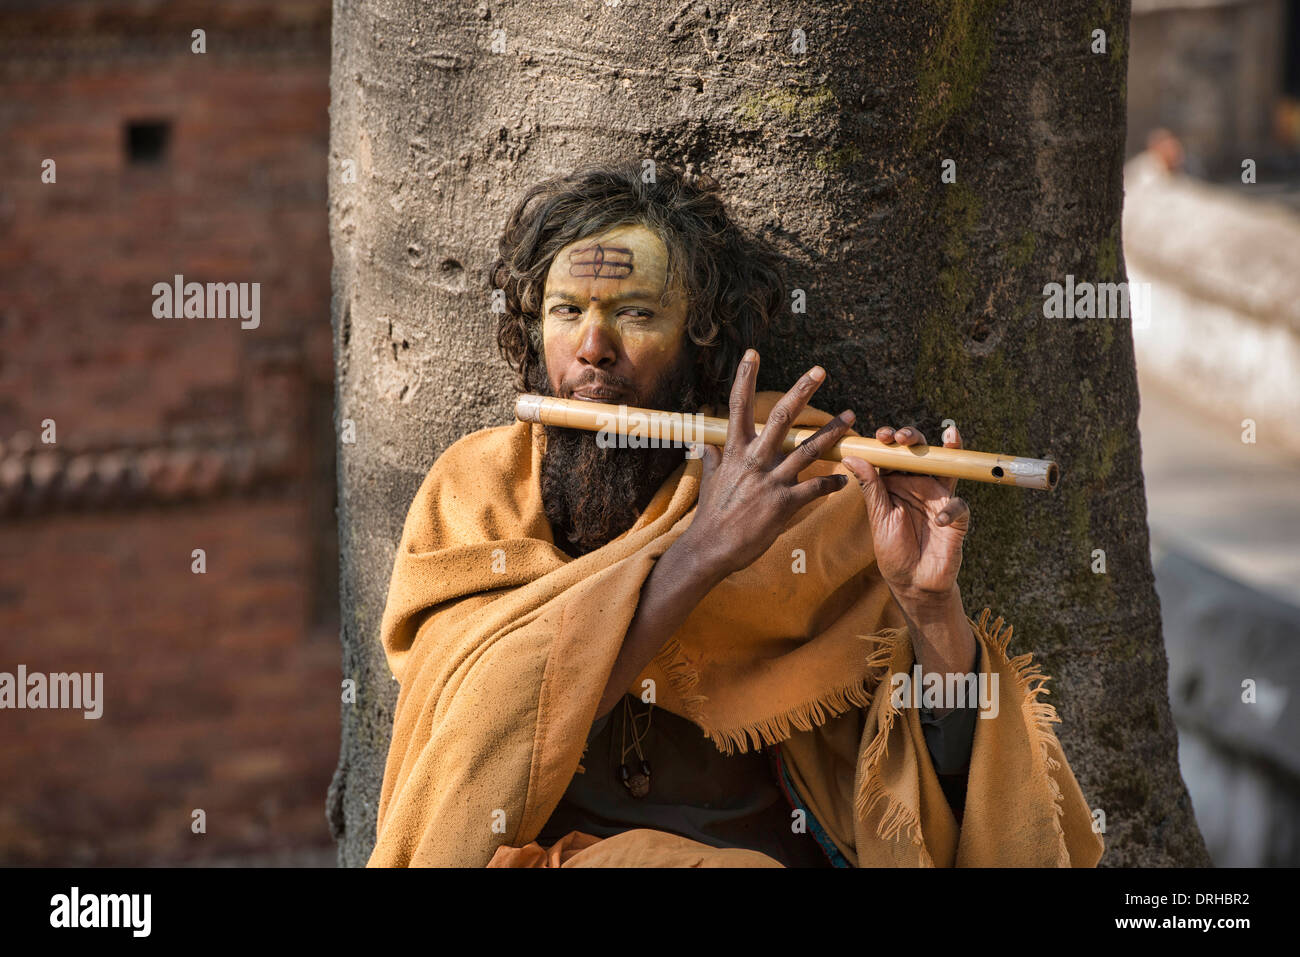 Sadhu playing his flute, Kathmandu, Nepal - Stock Image